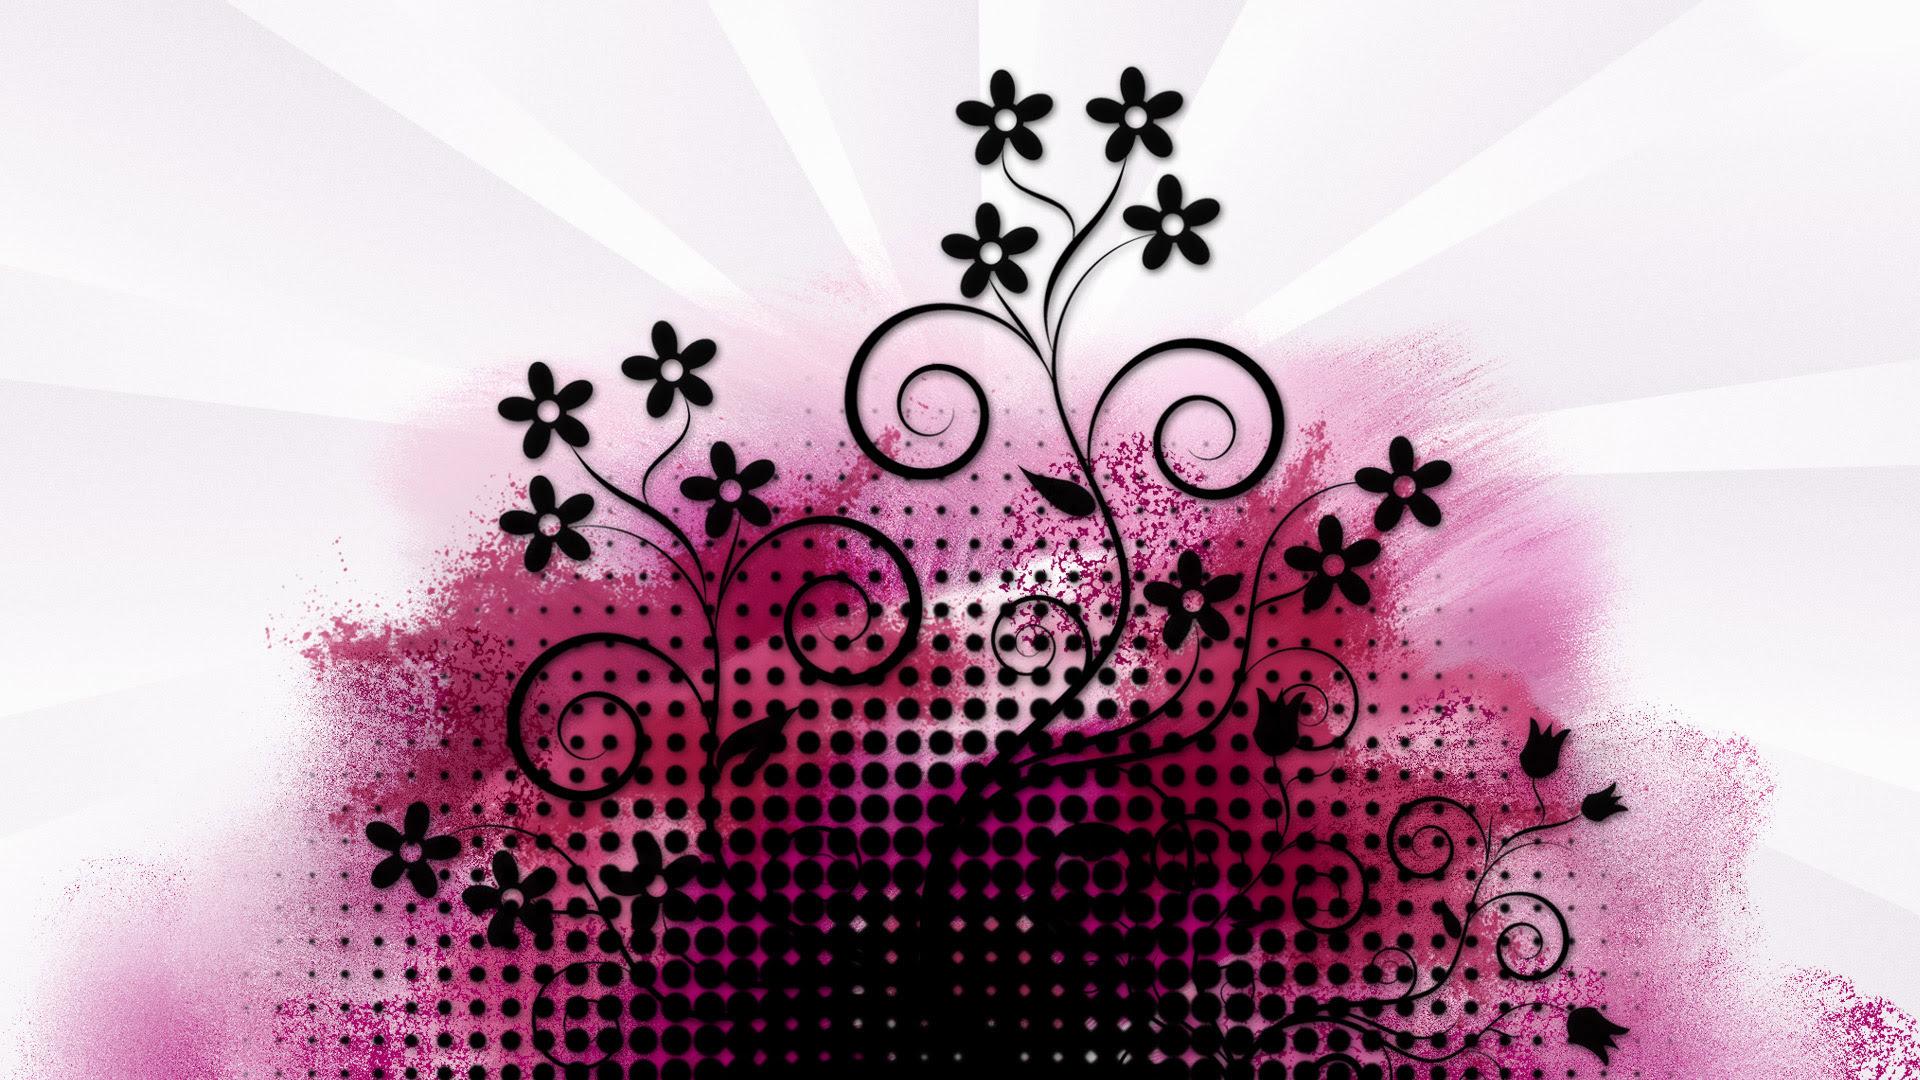 Wallpaper Hd Vector